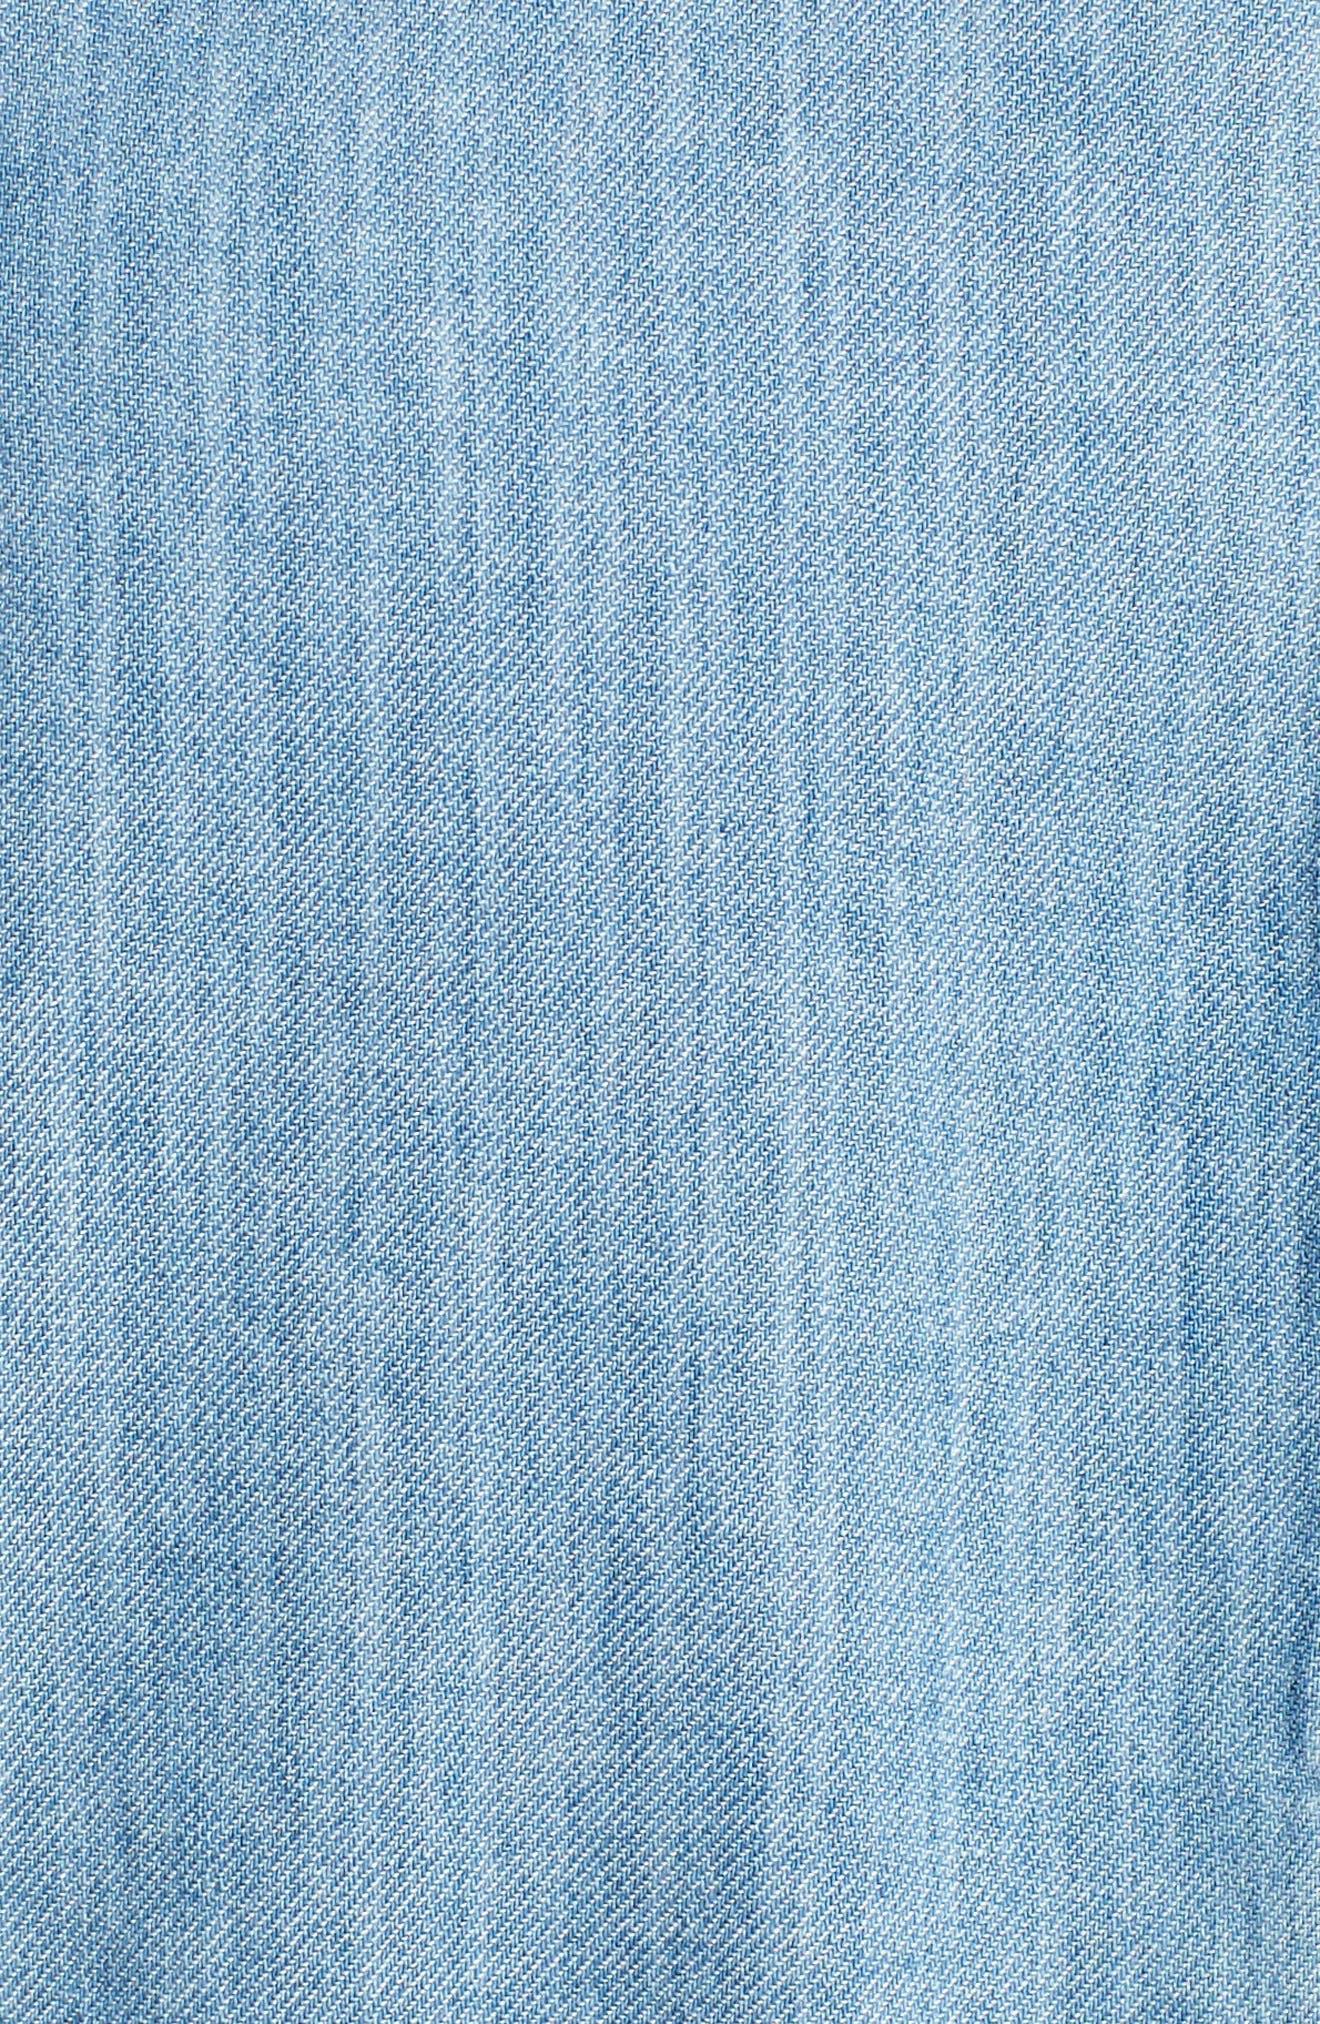 Tessa Denim Roll Sleeve Top,                             Alternate thumbnail 5, color,                             400